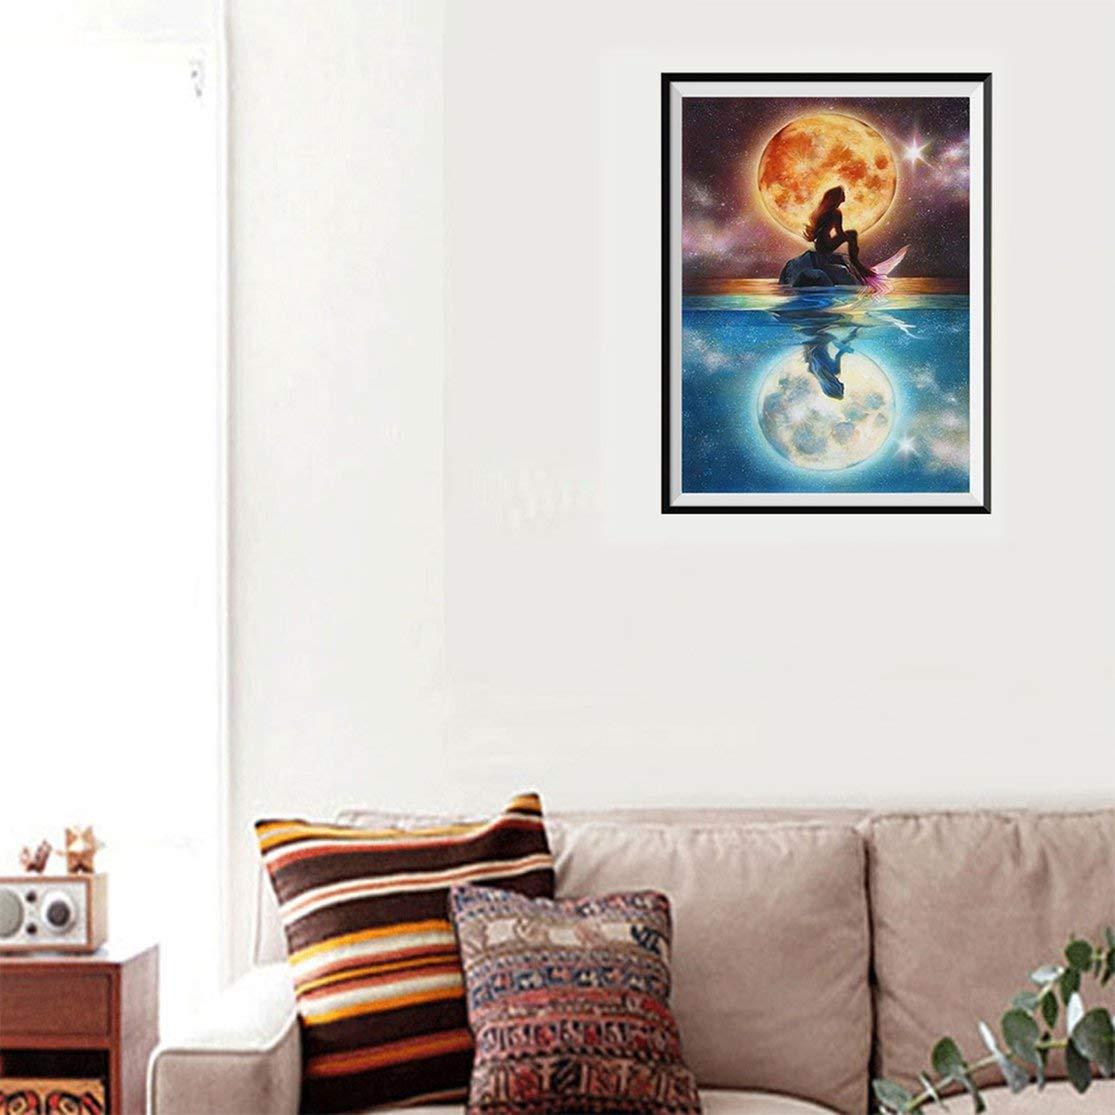 LouiseEvel215 Meerjungfrau Diamant Malerei Bunte Abstrakte Malerei Home Decoration Freunde und Familie